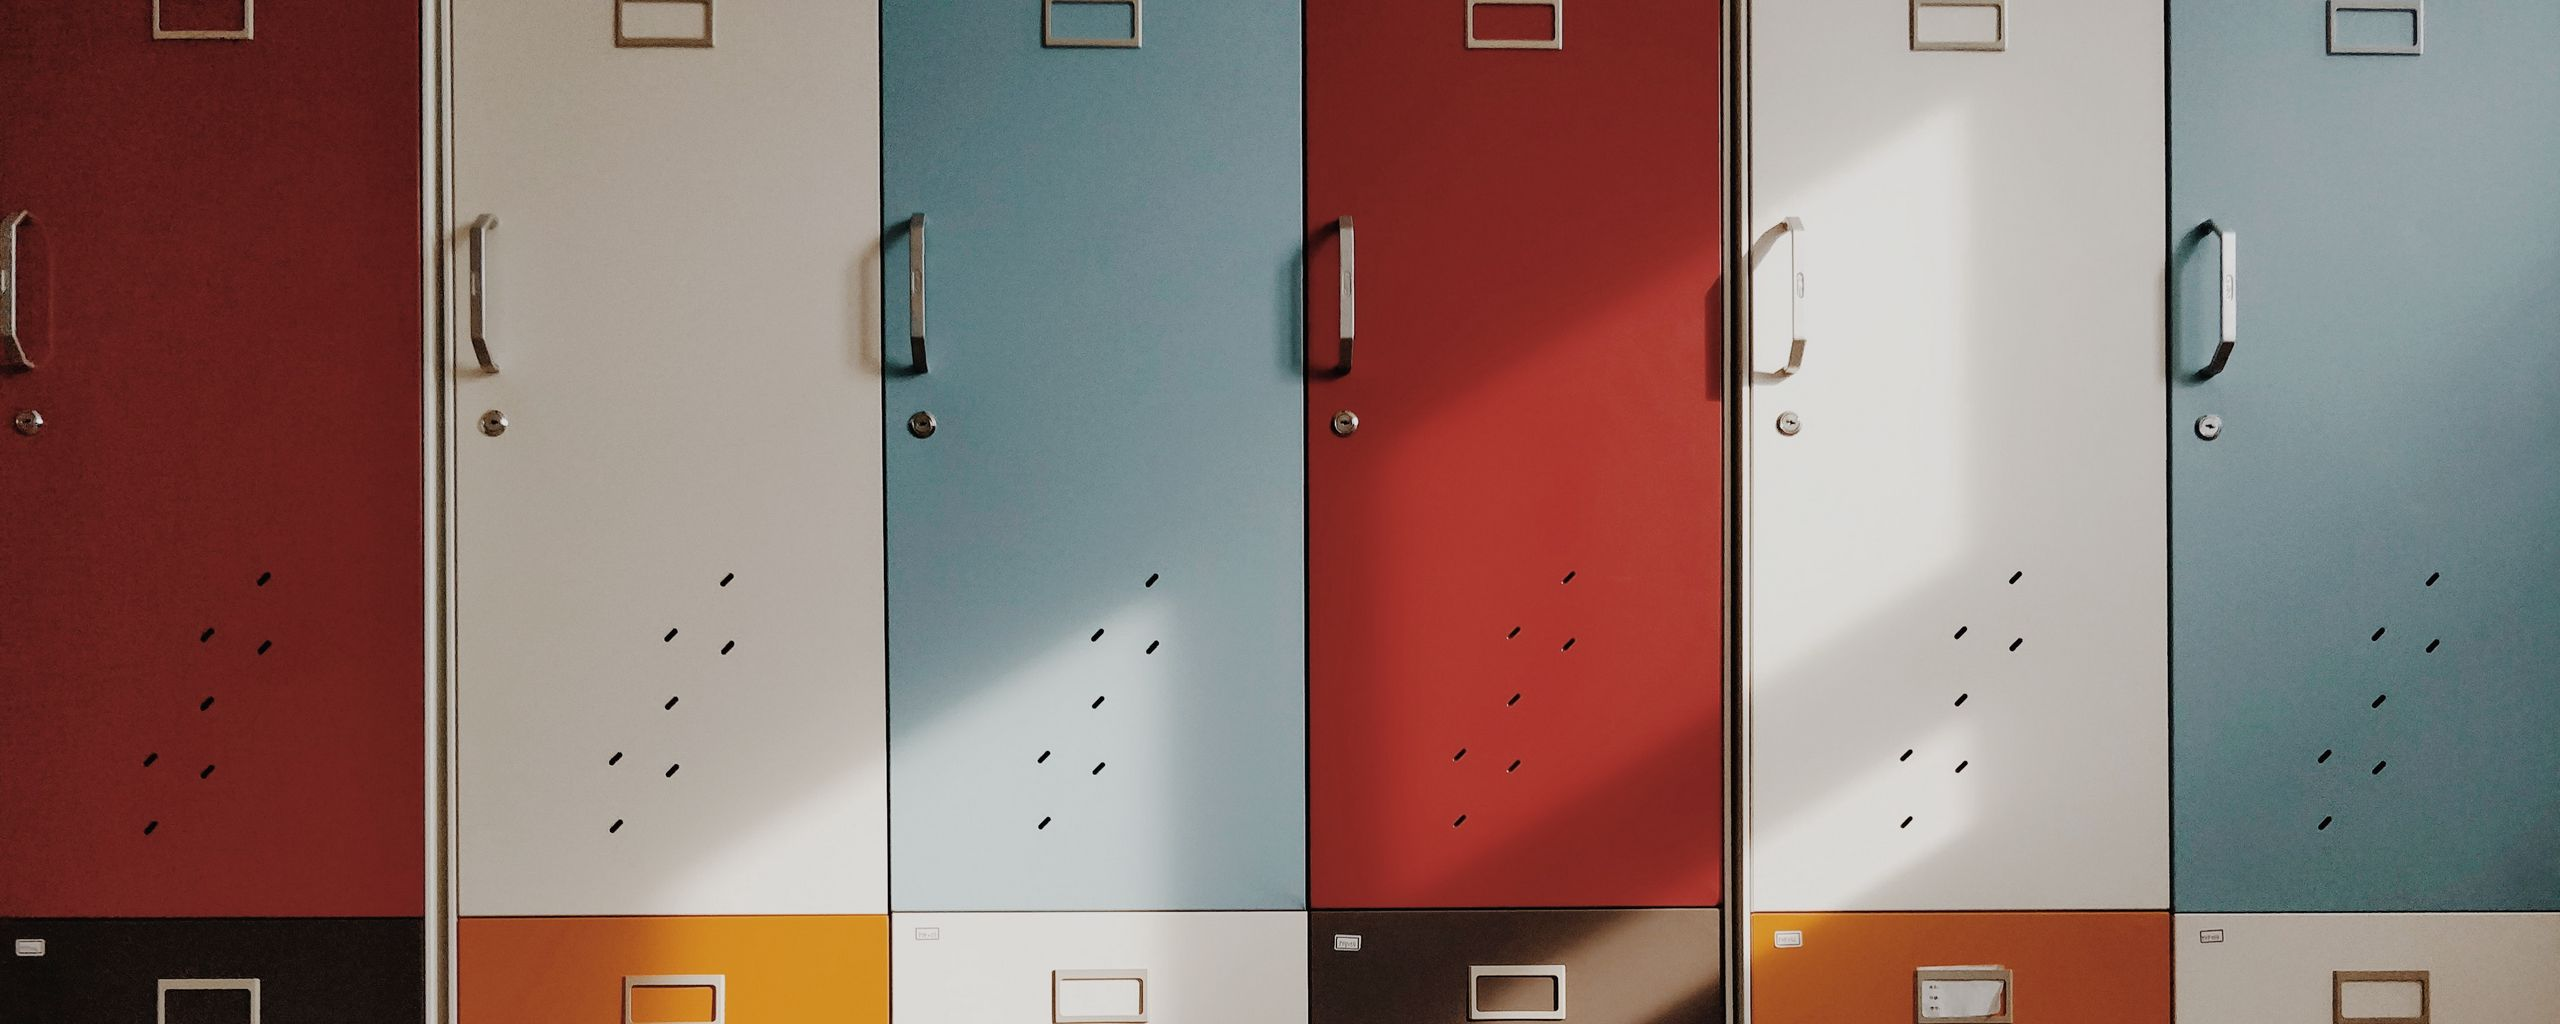 2560x1024 Wallpaper doors, lockers, retro, multicolored